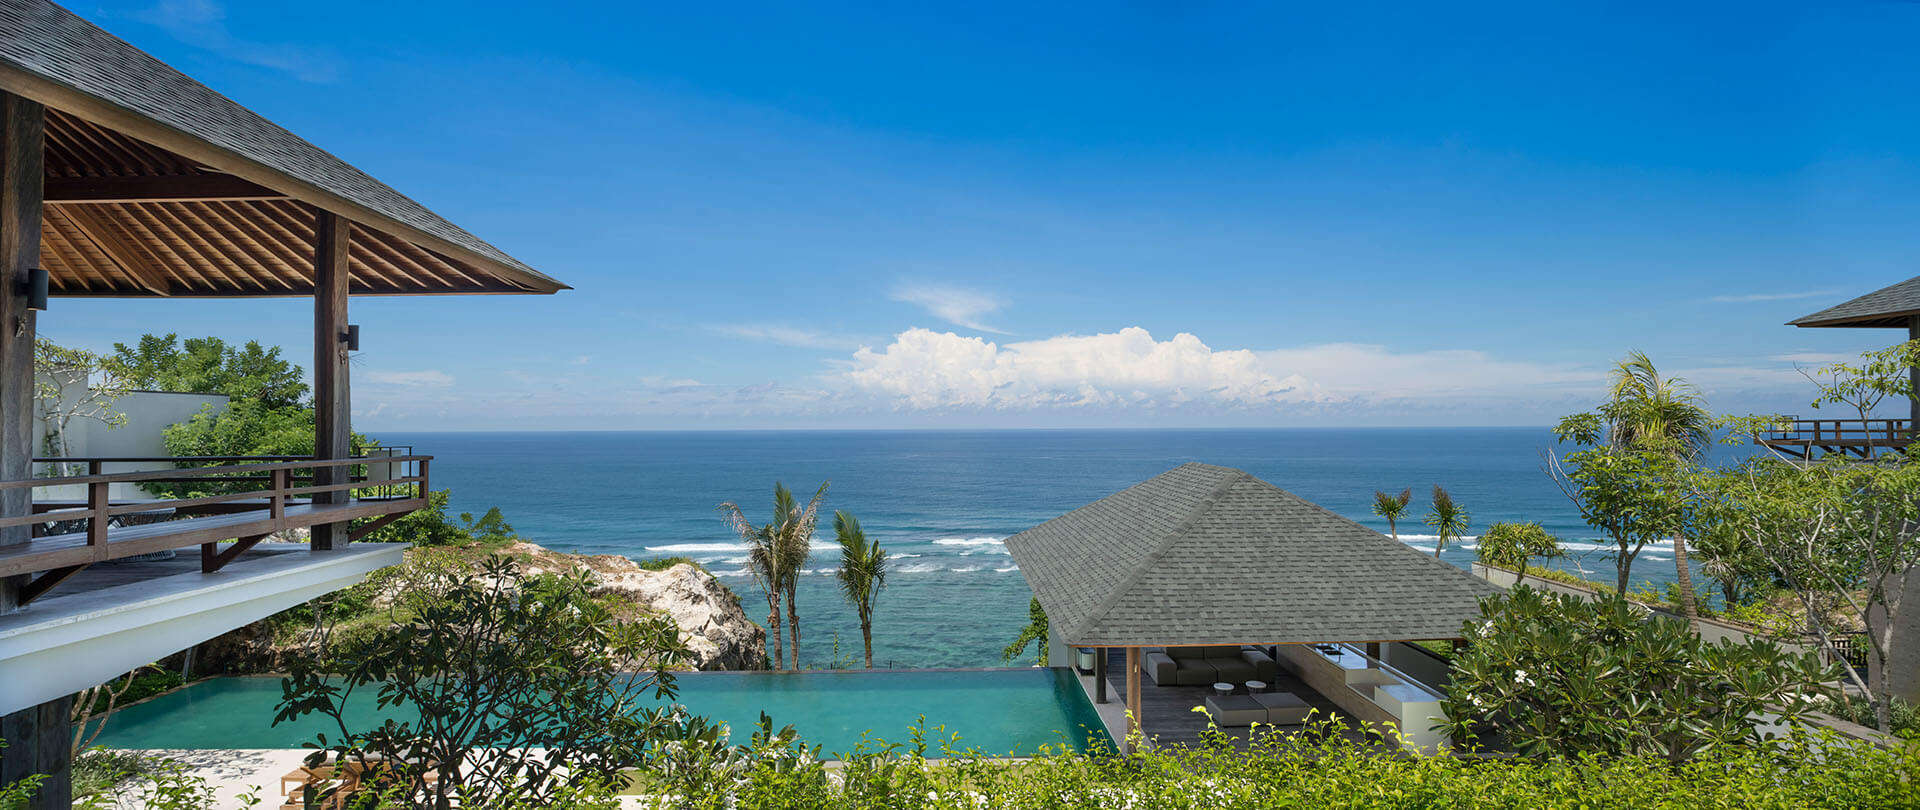 Luxury villa rentals asia - Indonesia - Bali - The bukit - Soham - Image 1/21